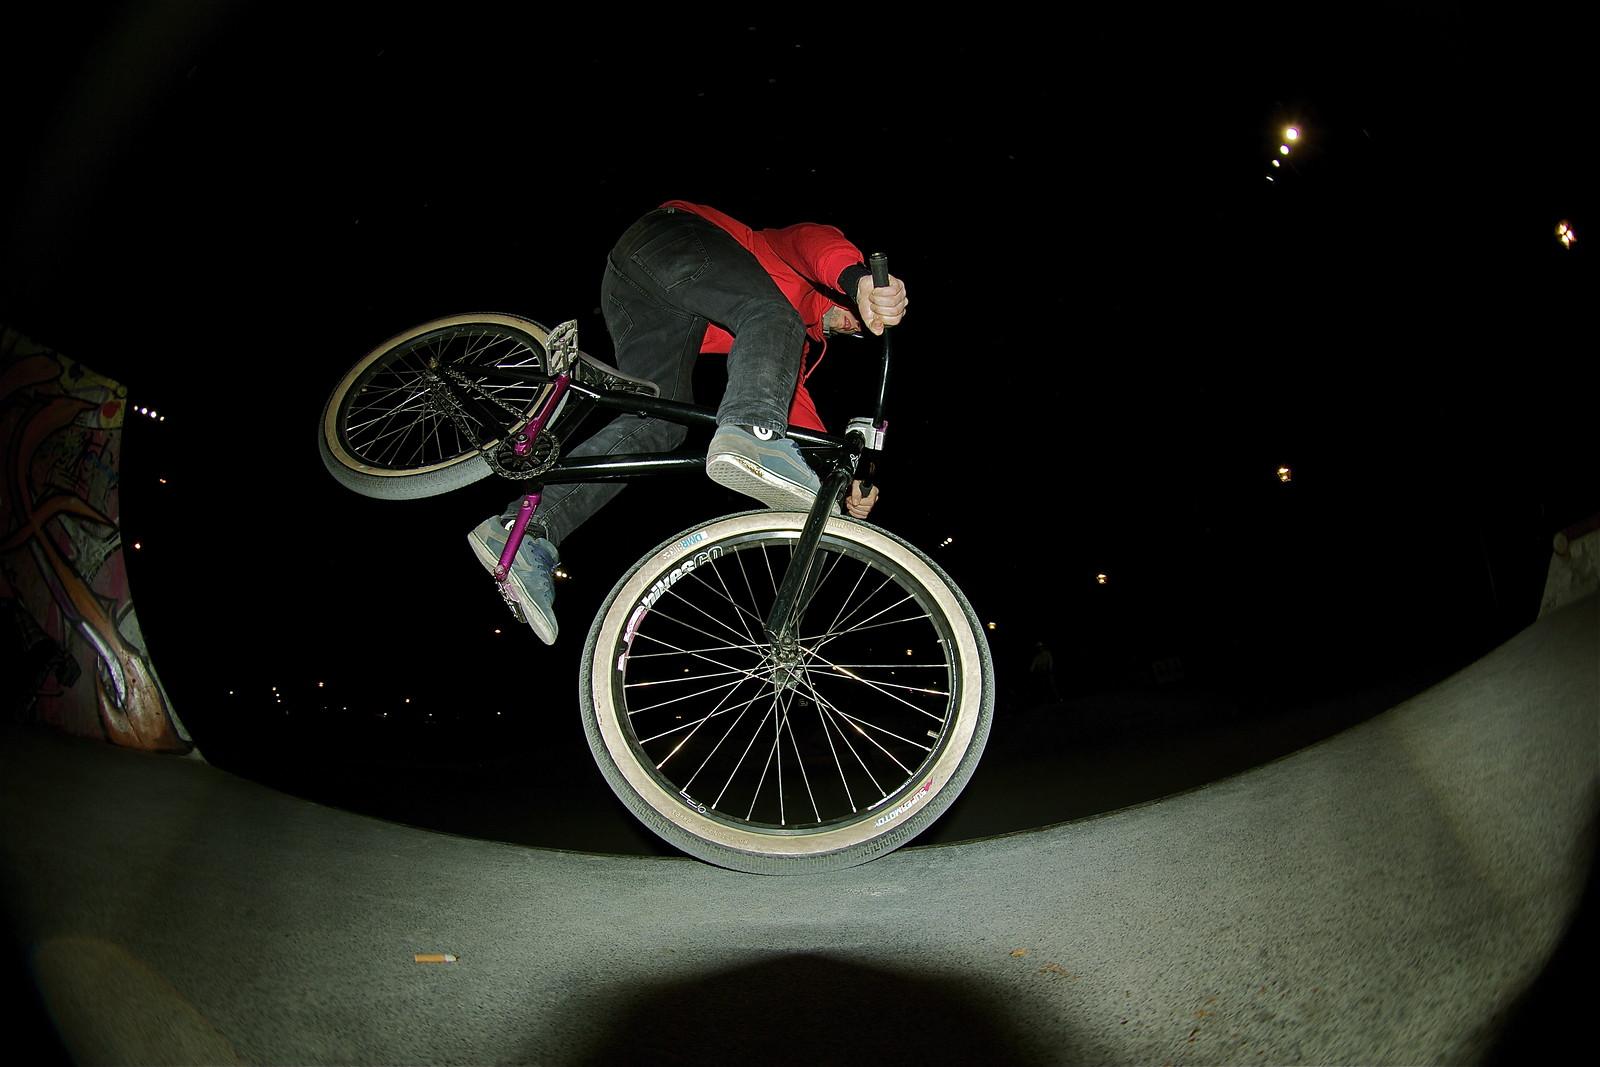 IMG 3274 - egino - Mountain Biking Pictures - Vital MTB